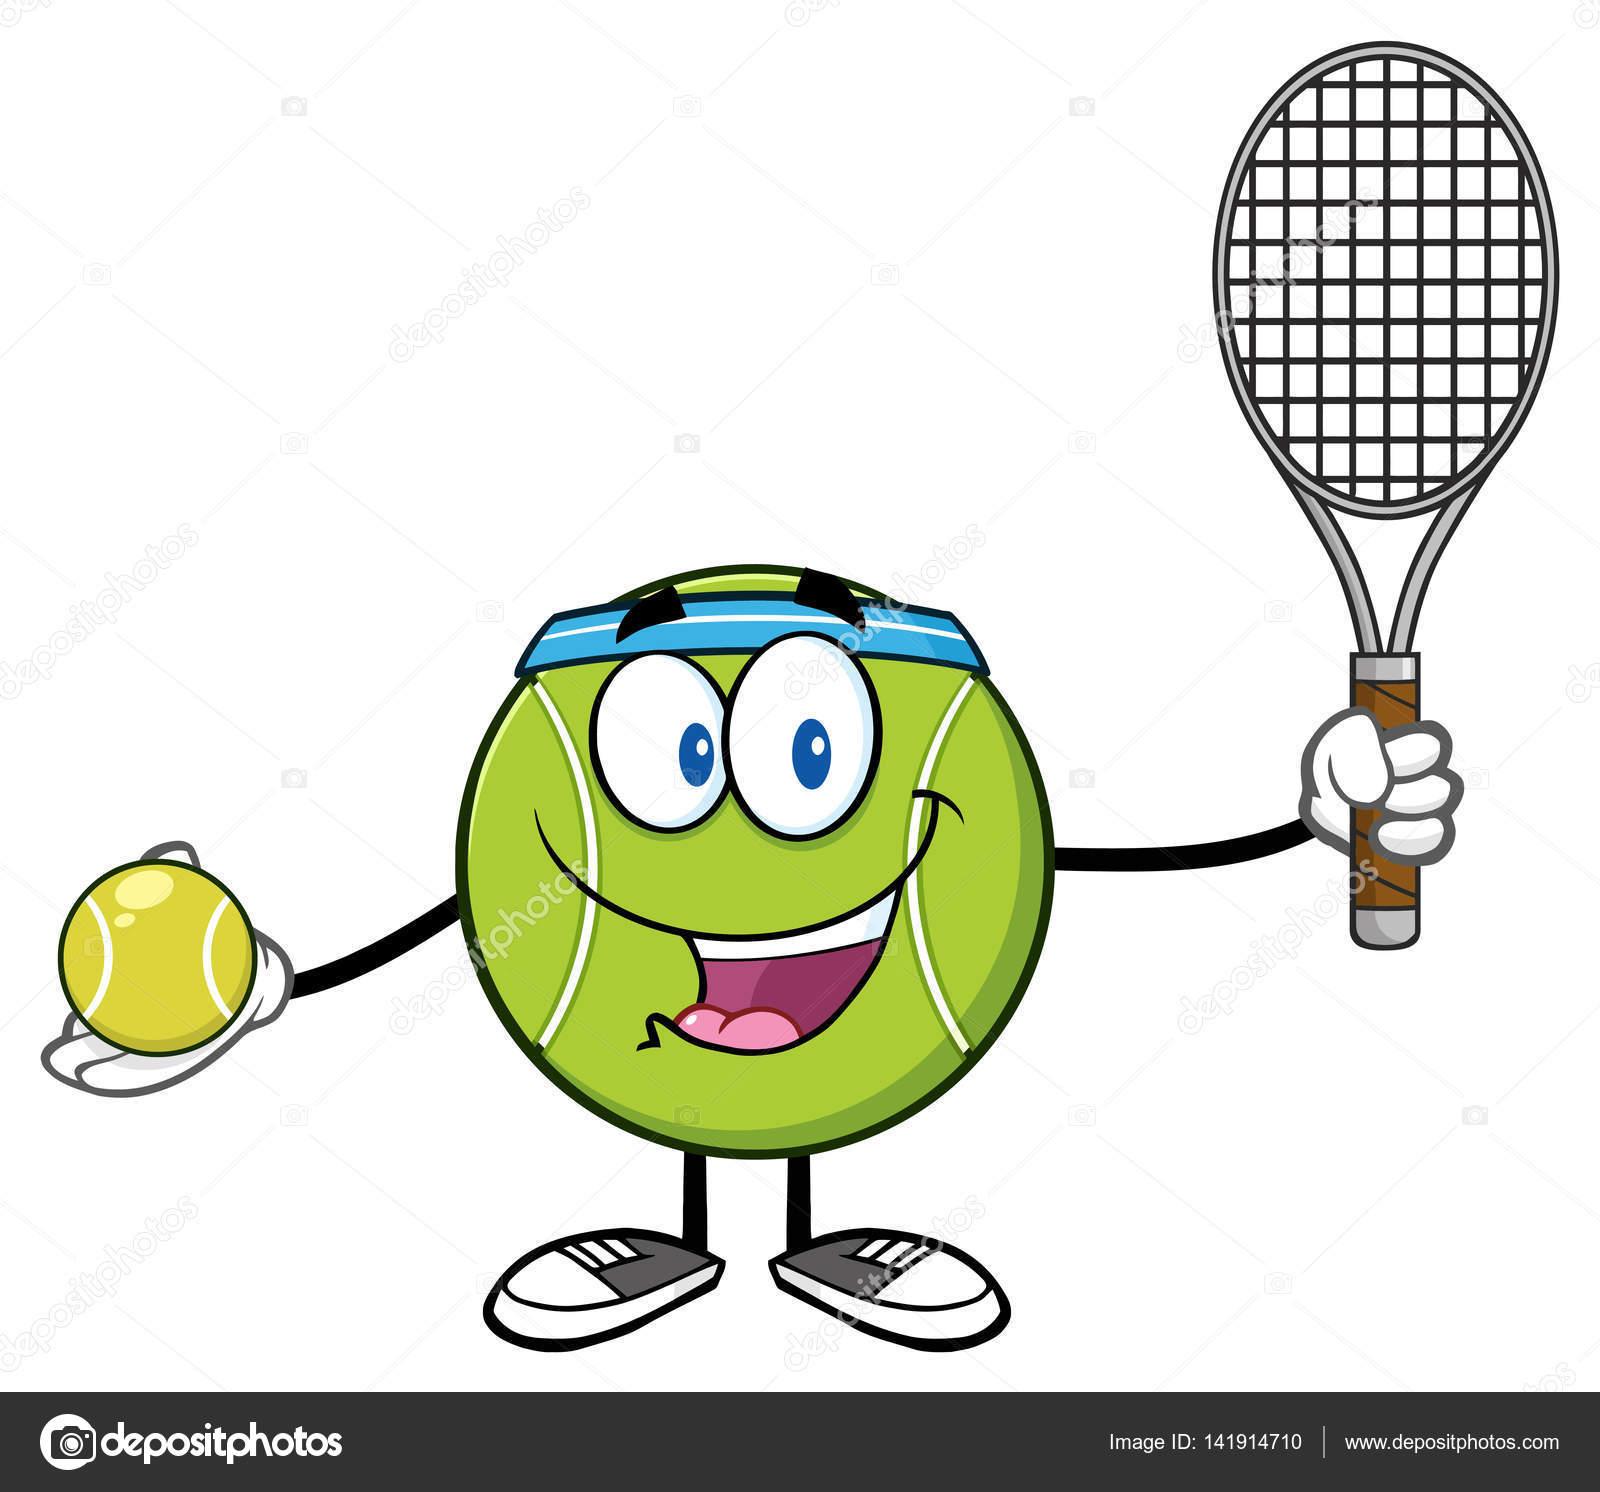 Tenis pelota stock de ilustracion ilustracion libre de stock de - Tenis Ball Personaje De Dibujos Animados Jugador Con Raqueta Y Pelota De Tenis Ilustraci N Raster Aislado En Blanco Vector De Hittoon